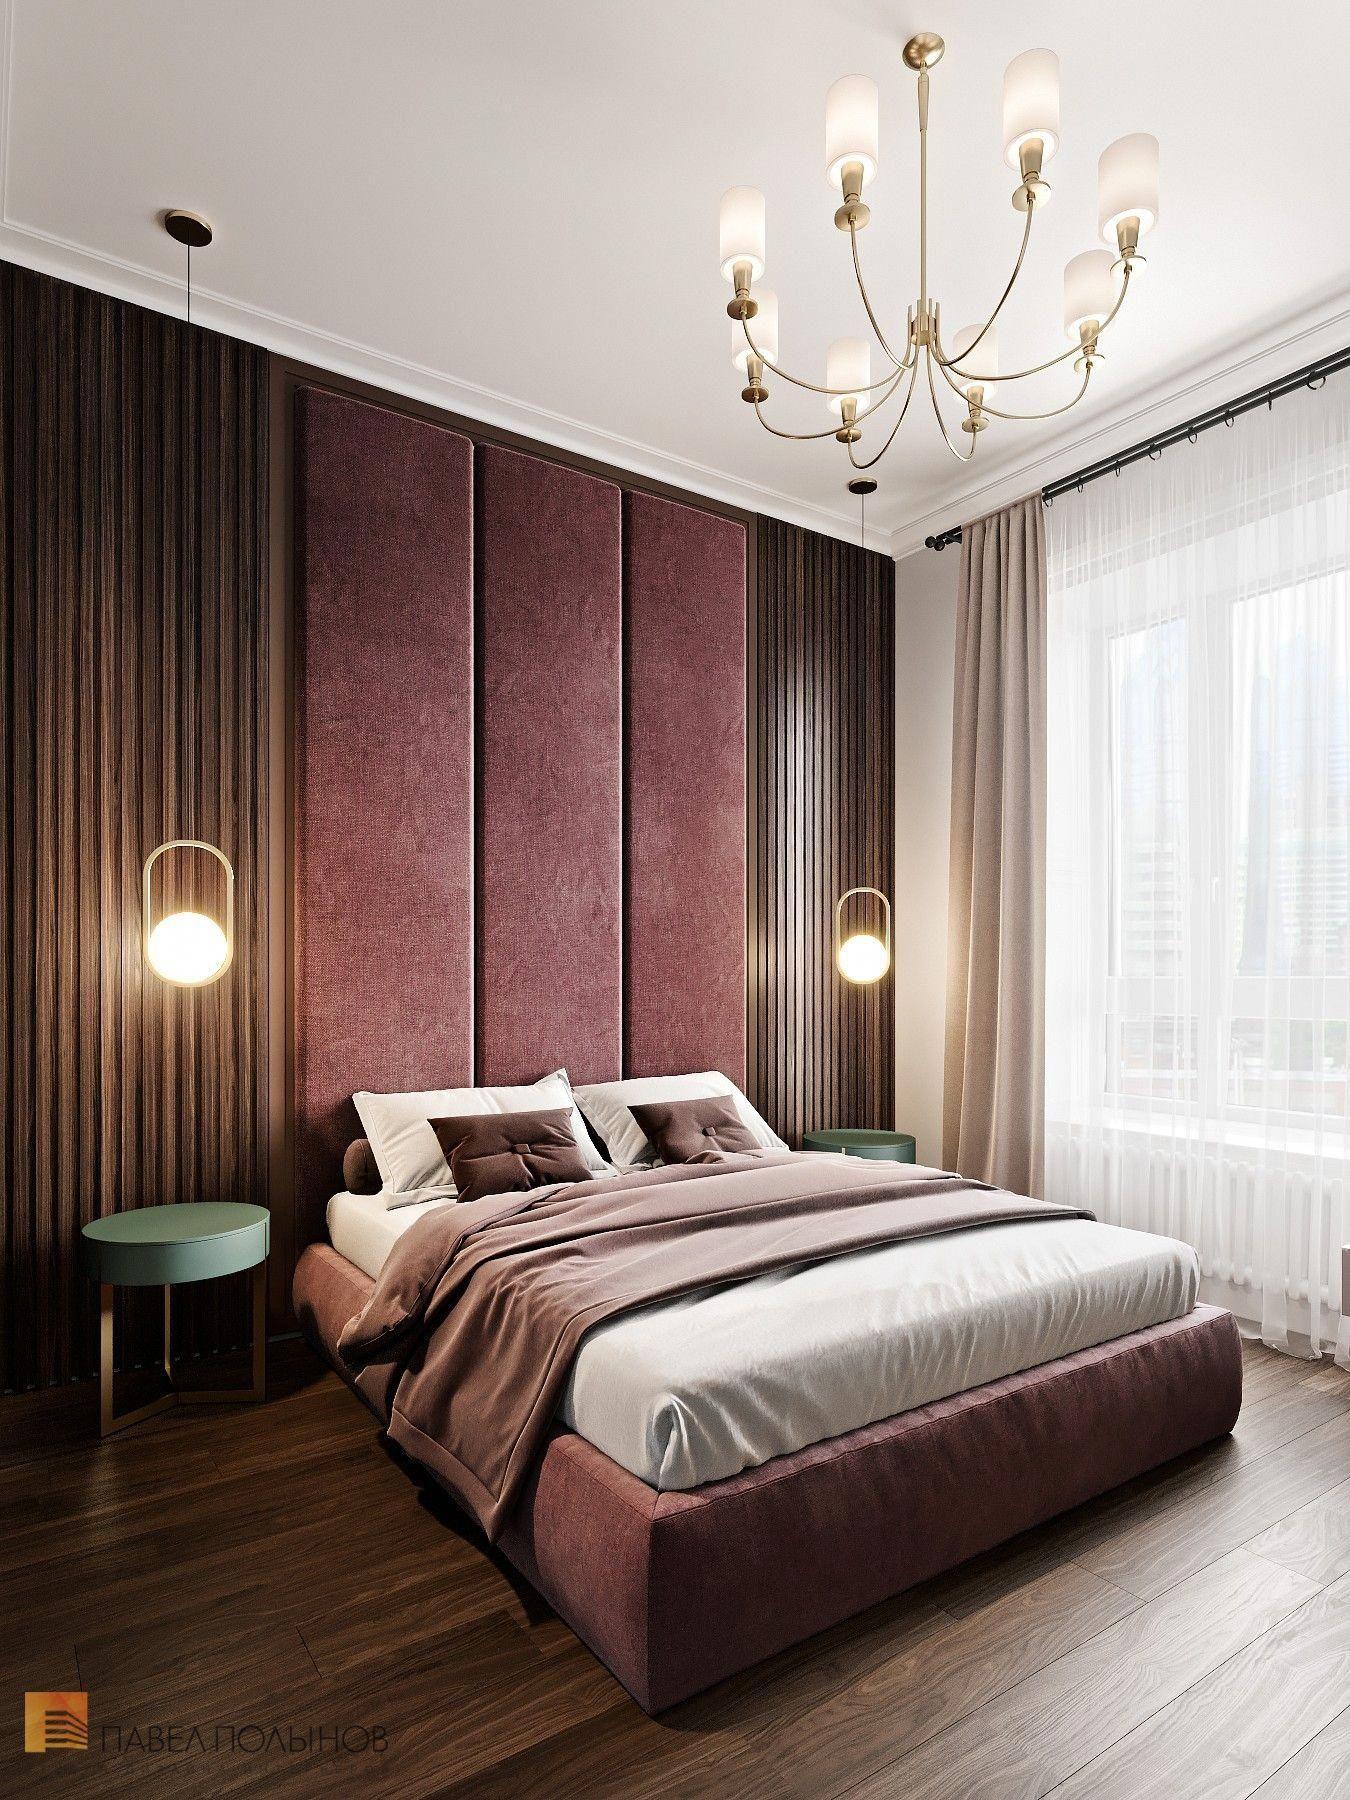 Bedroom Looks Bedroom Styles 2016 The Best Bed Designs